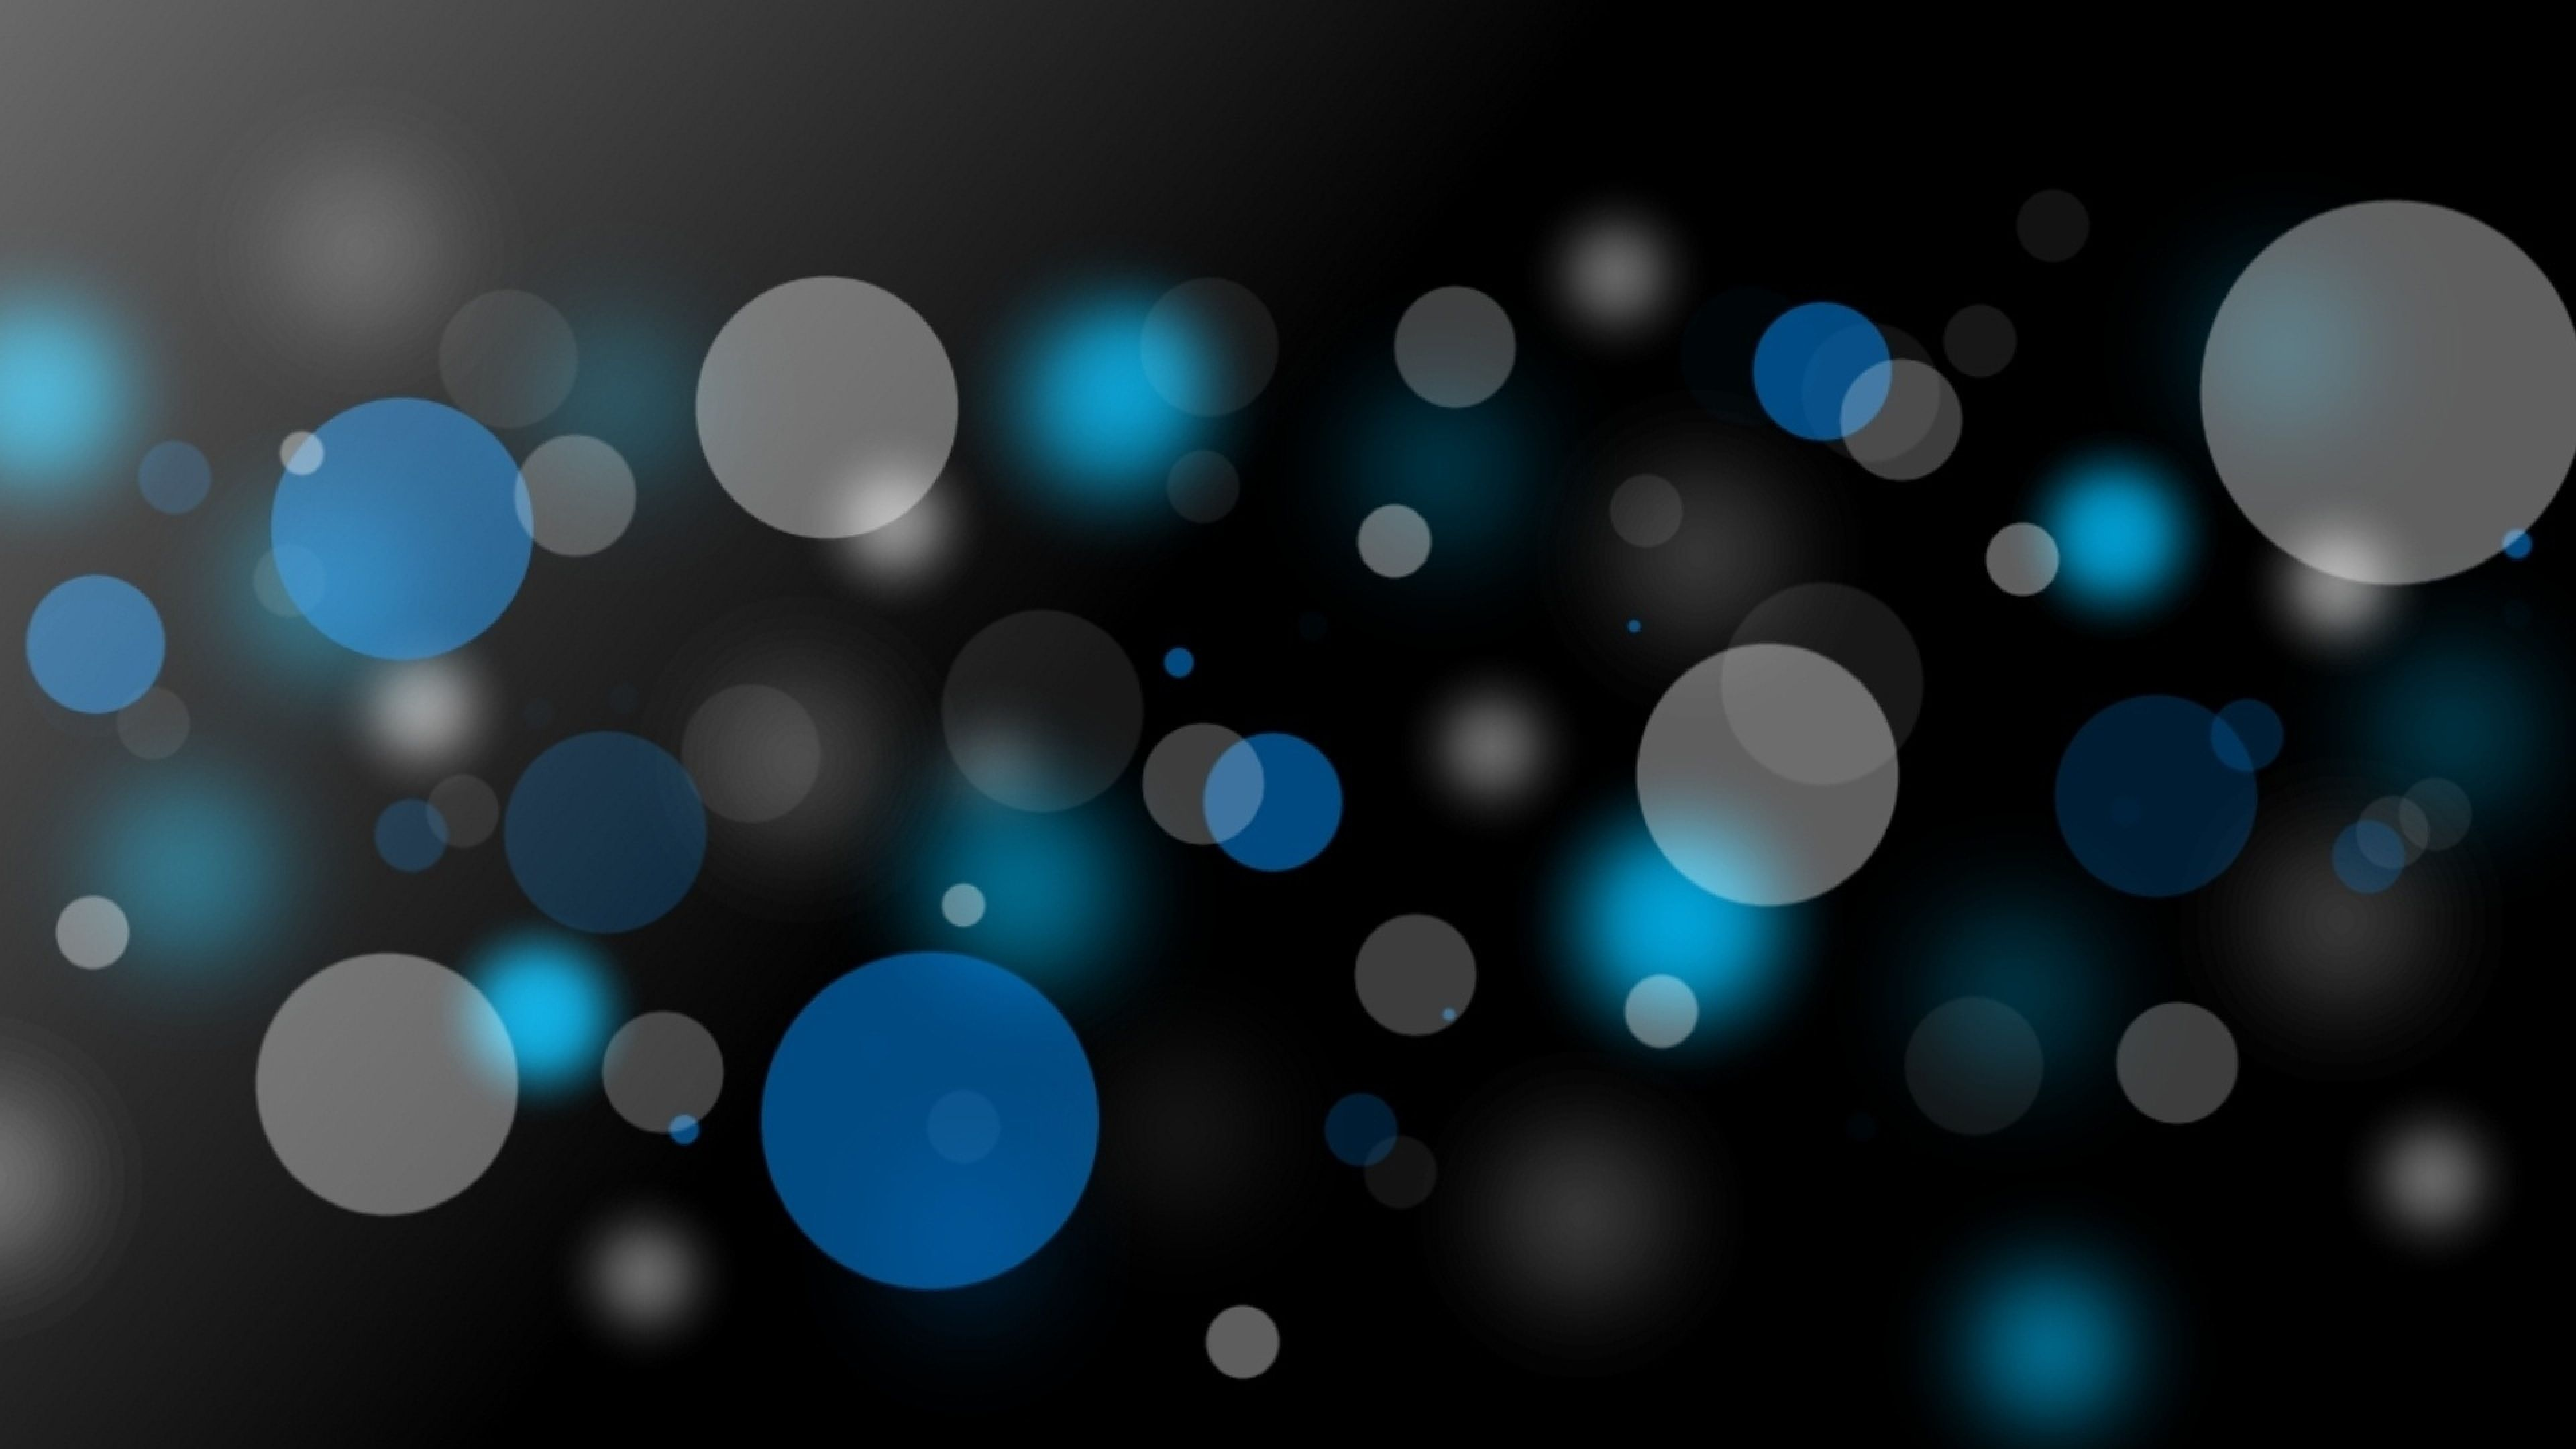 3840x2160 Wallpaper Dark Circle Gray Black Dark Wallpaper